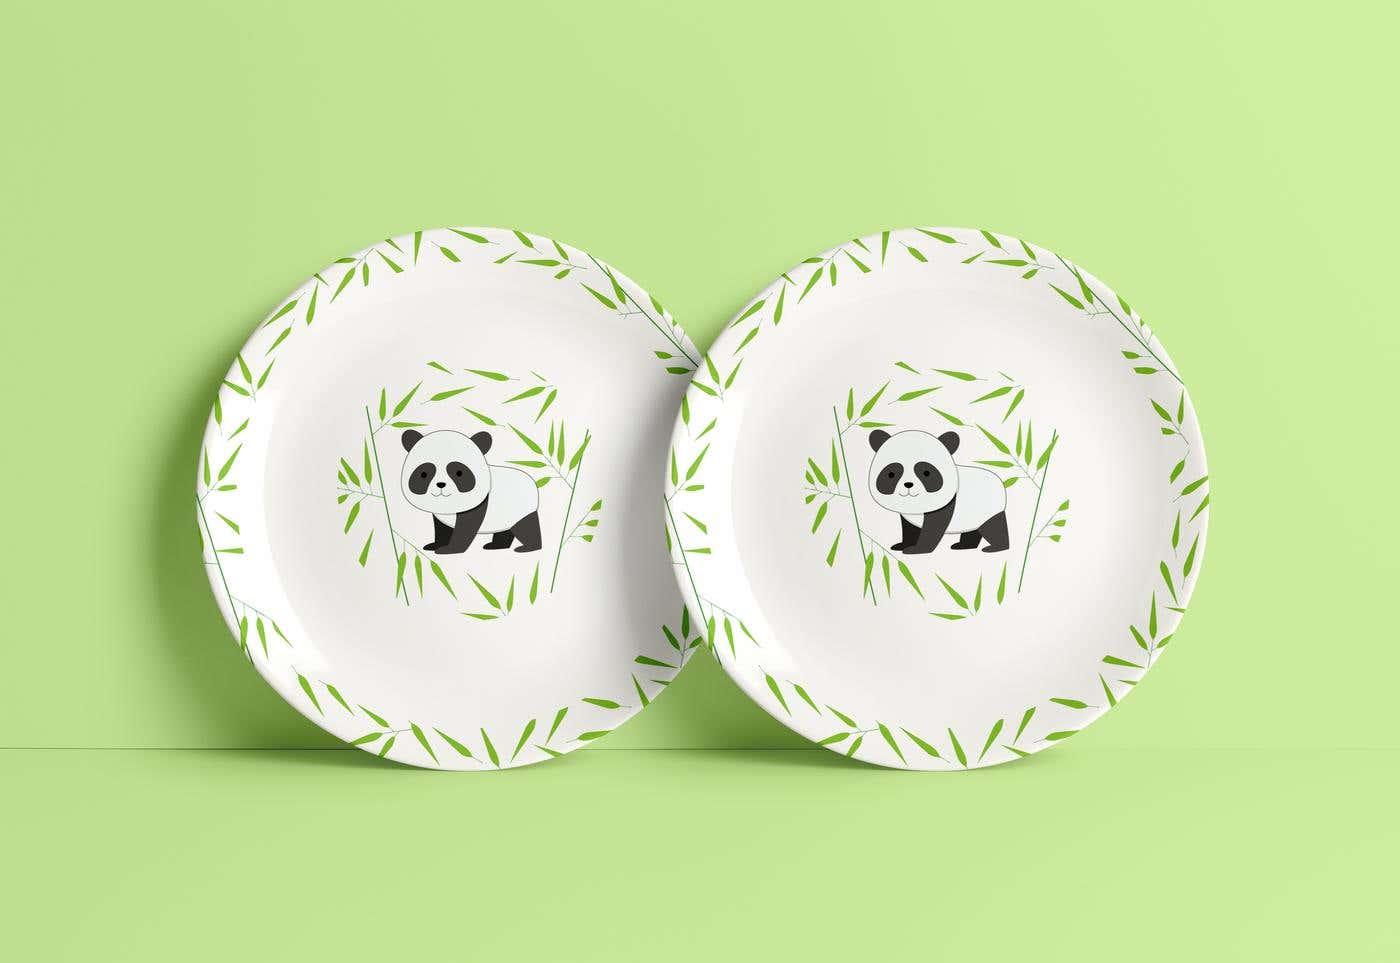 guant-panda-plate.jpg